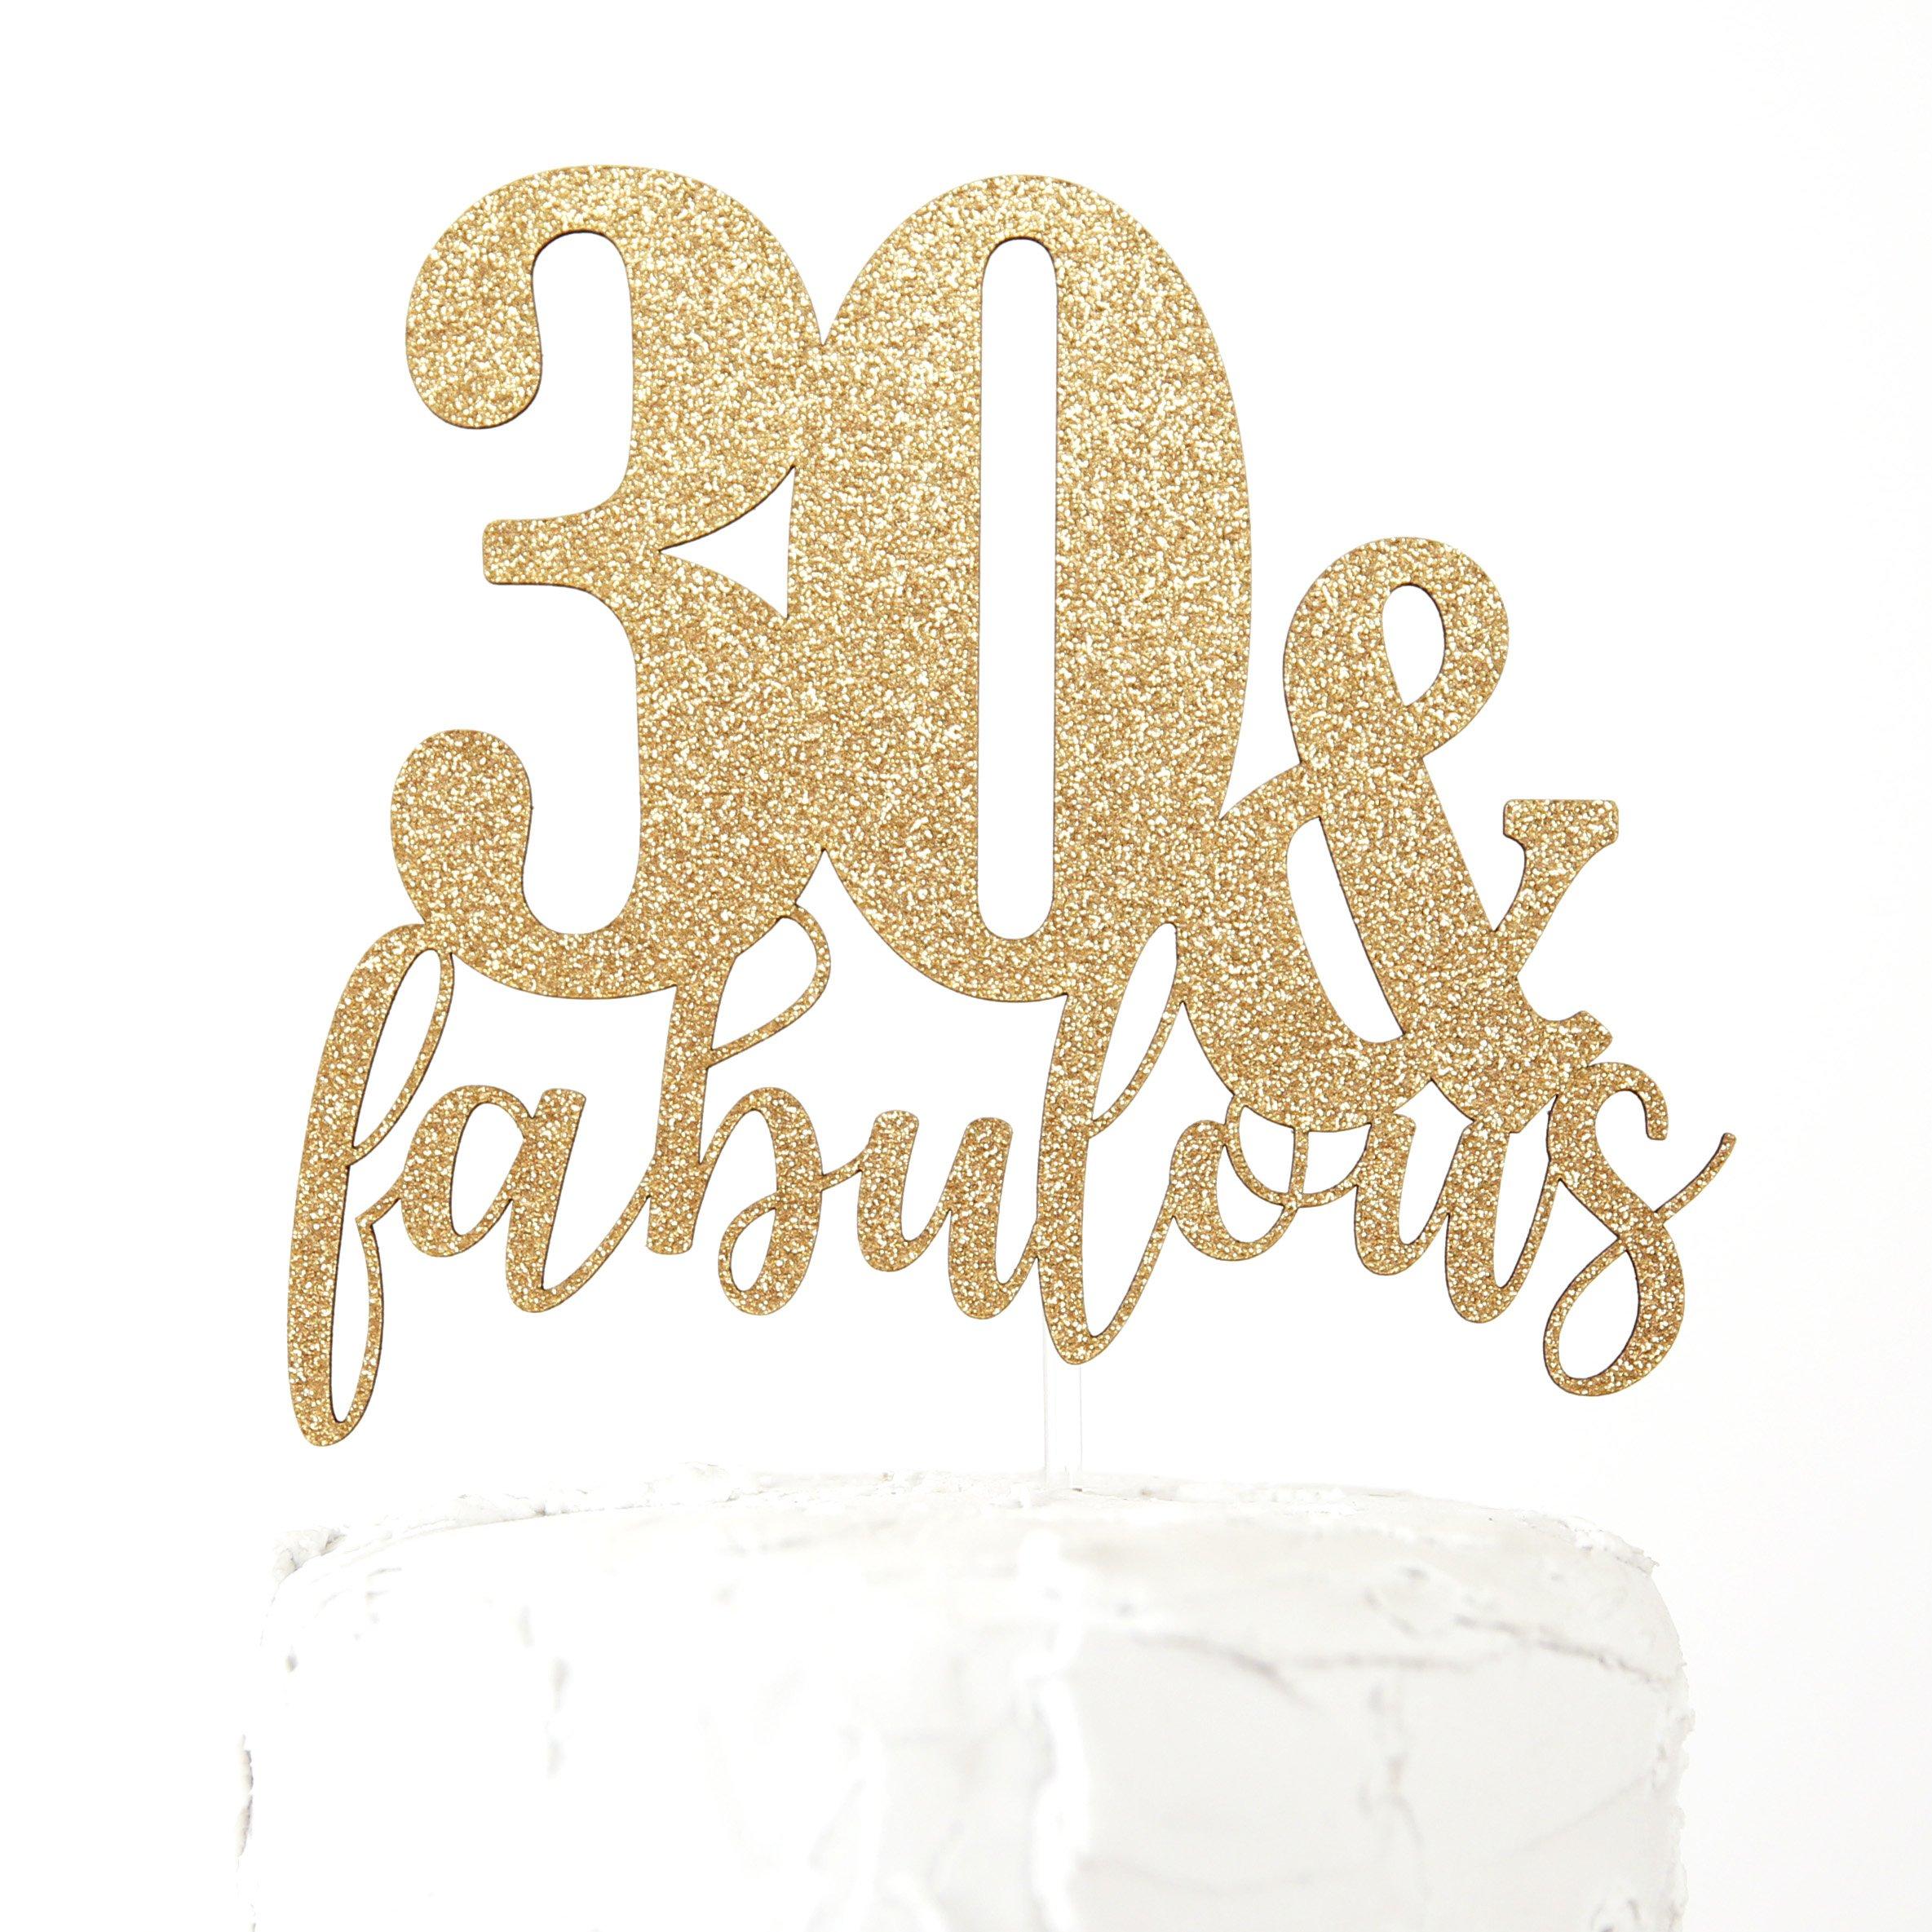 NANASUKO 30th Birthday Cake Topper - 30 & fabulous - Premium quality Made in USA